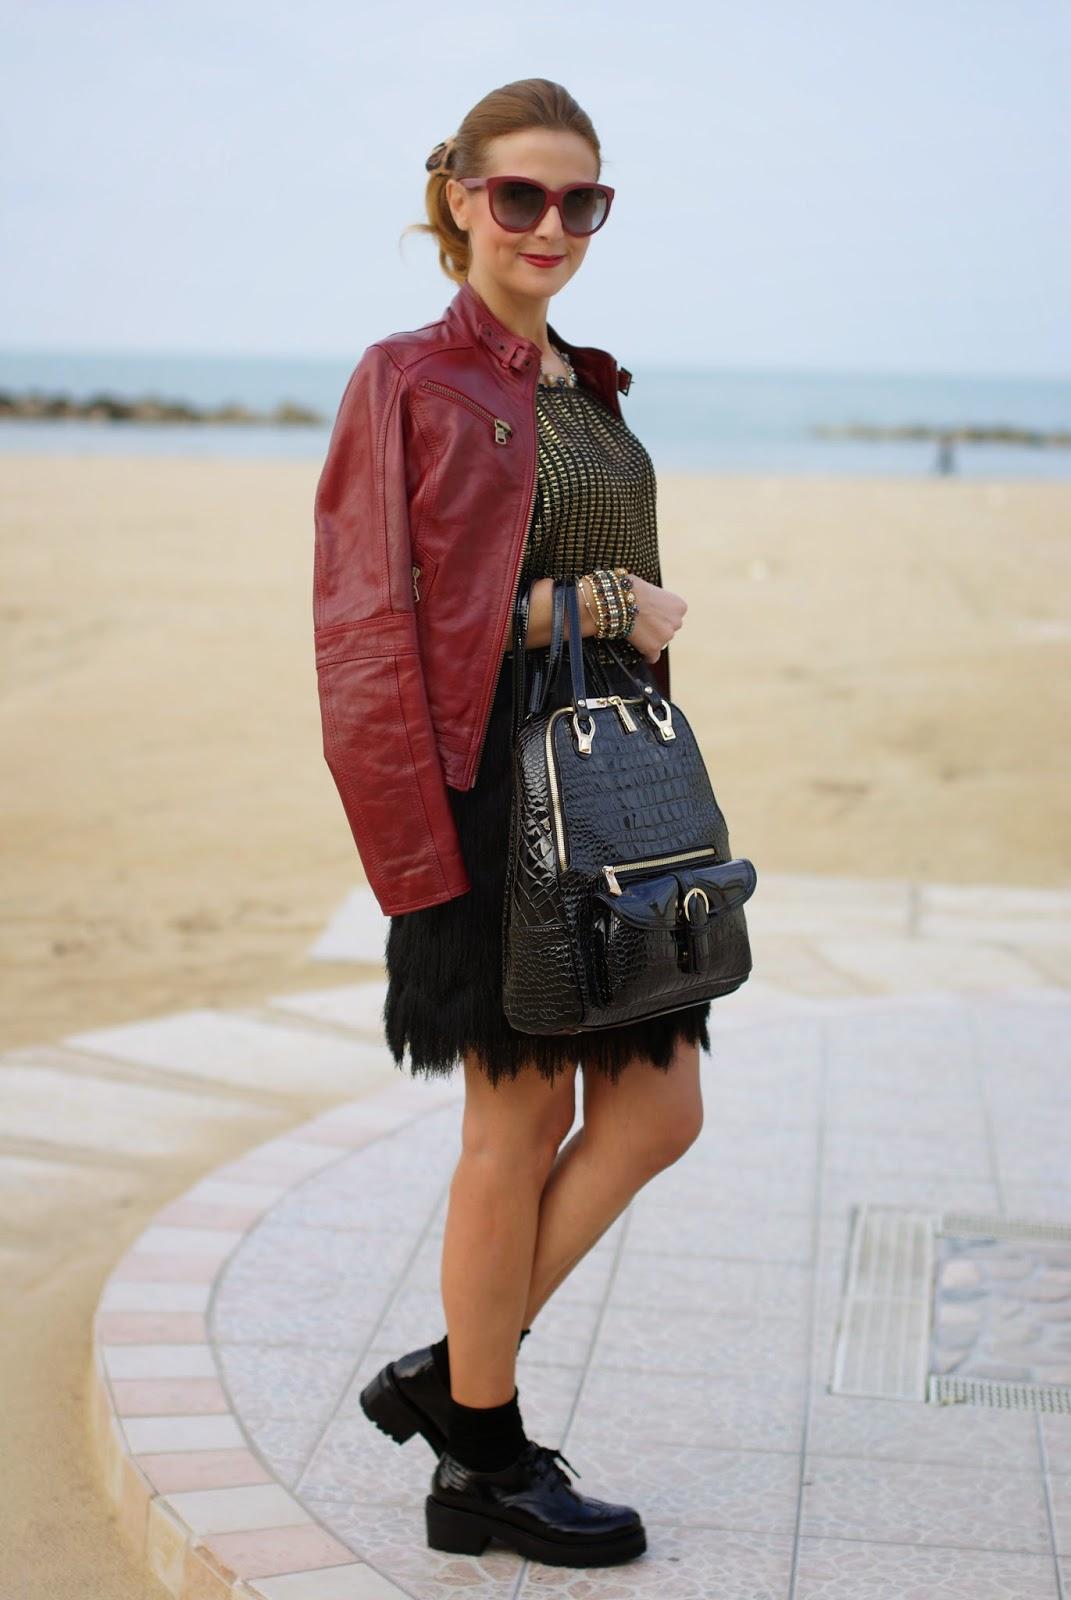 Sodini bijoux new fall winter collection, verysimple, Nando Muzi brogues, backpack trend, zaino verysimple, Fashion and Cookies, fashion blogger